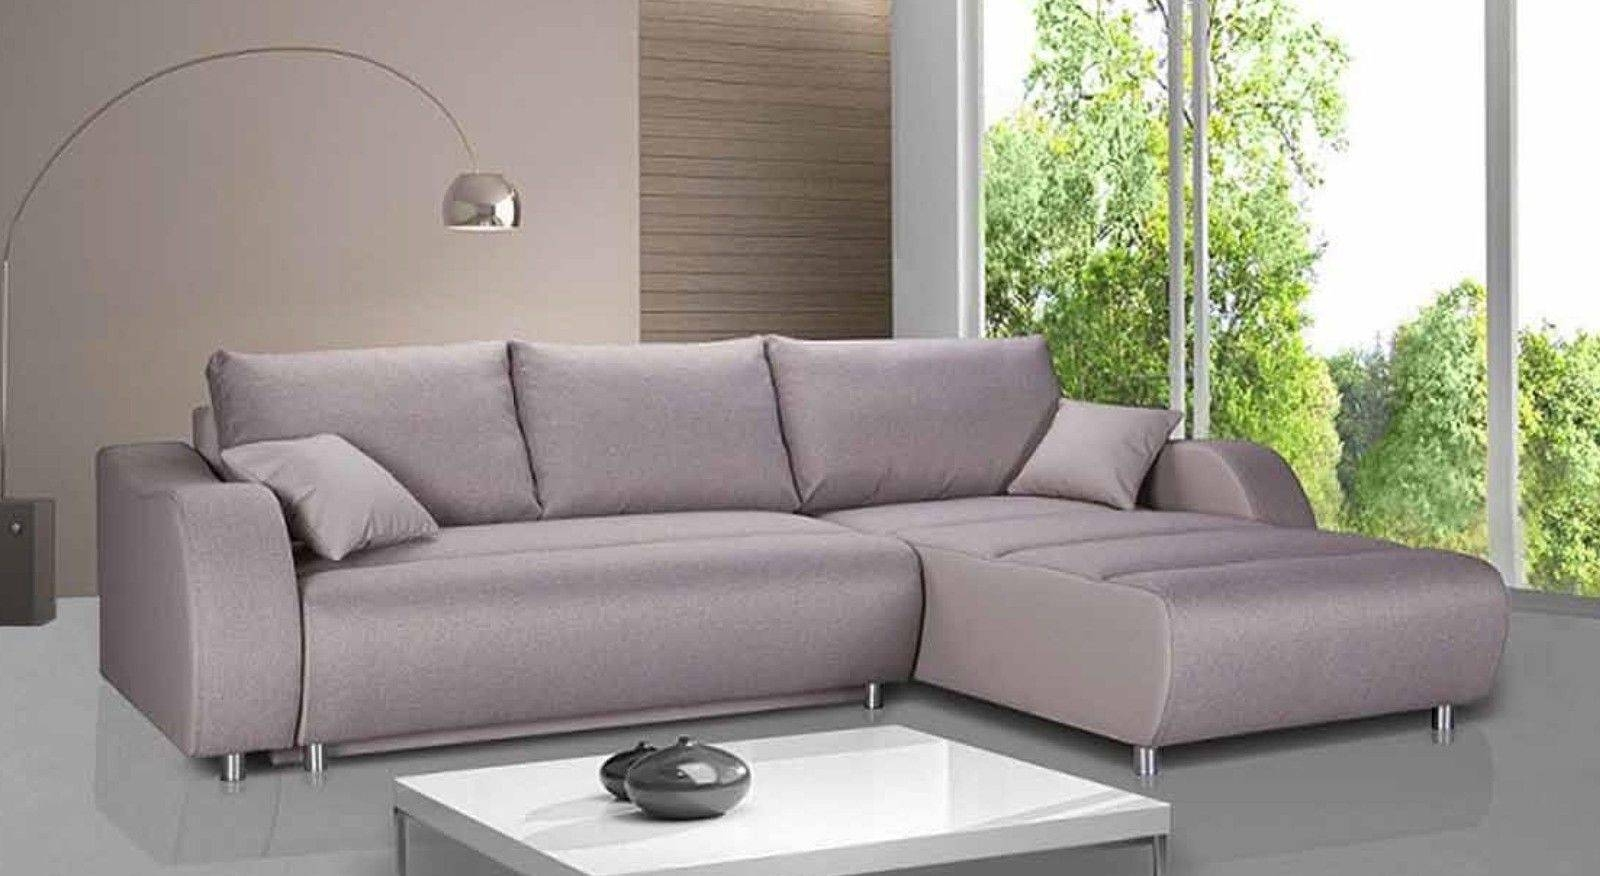 Corner Sofa Fabric. Gray Corner Sofa Fabric Modern Sofas pertaining to Fabric Corner Sofa Bed (Image 13 of 30)